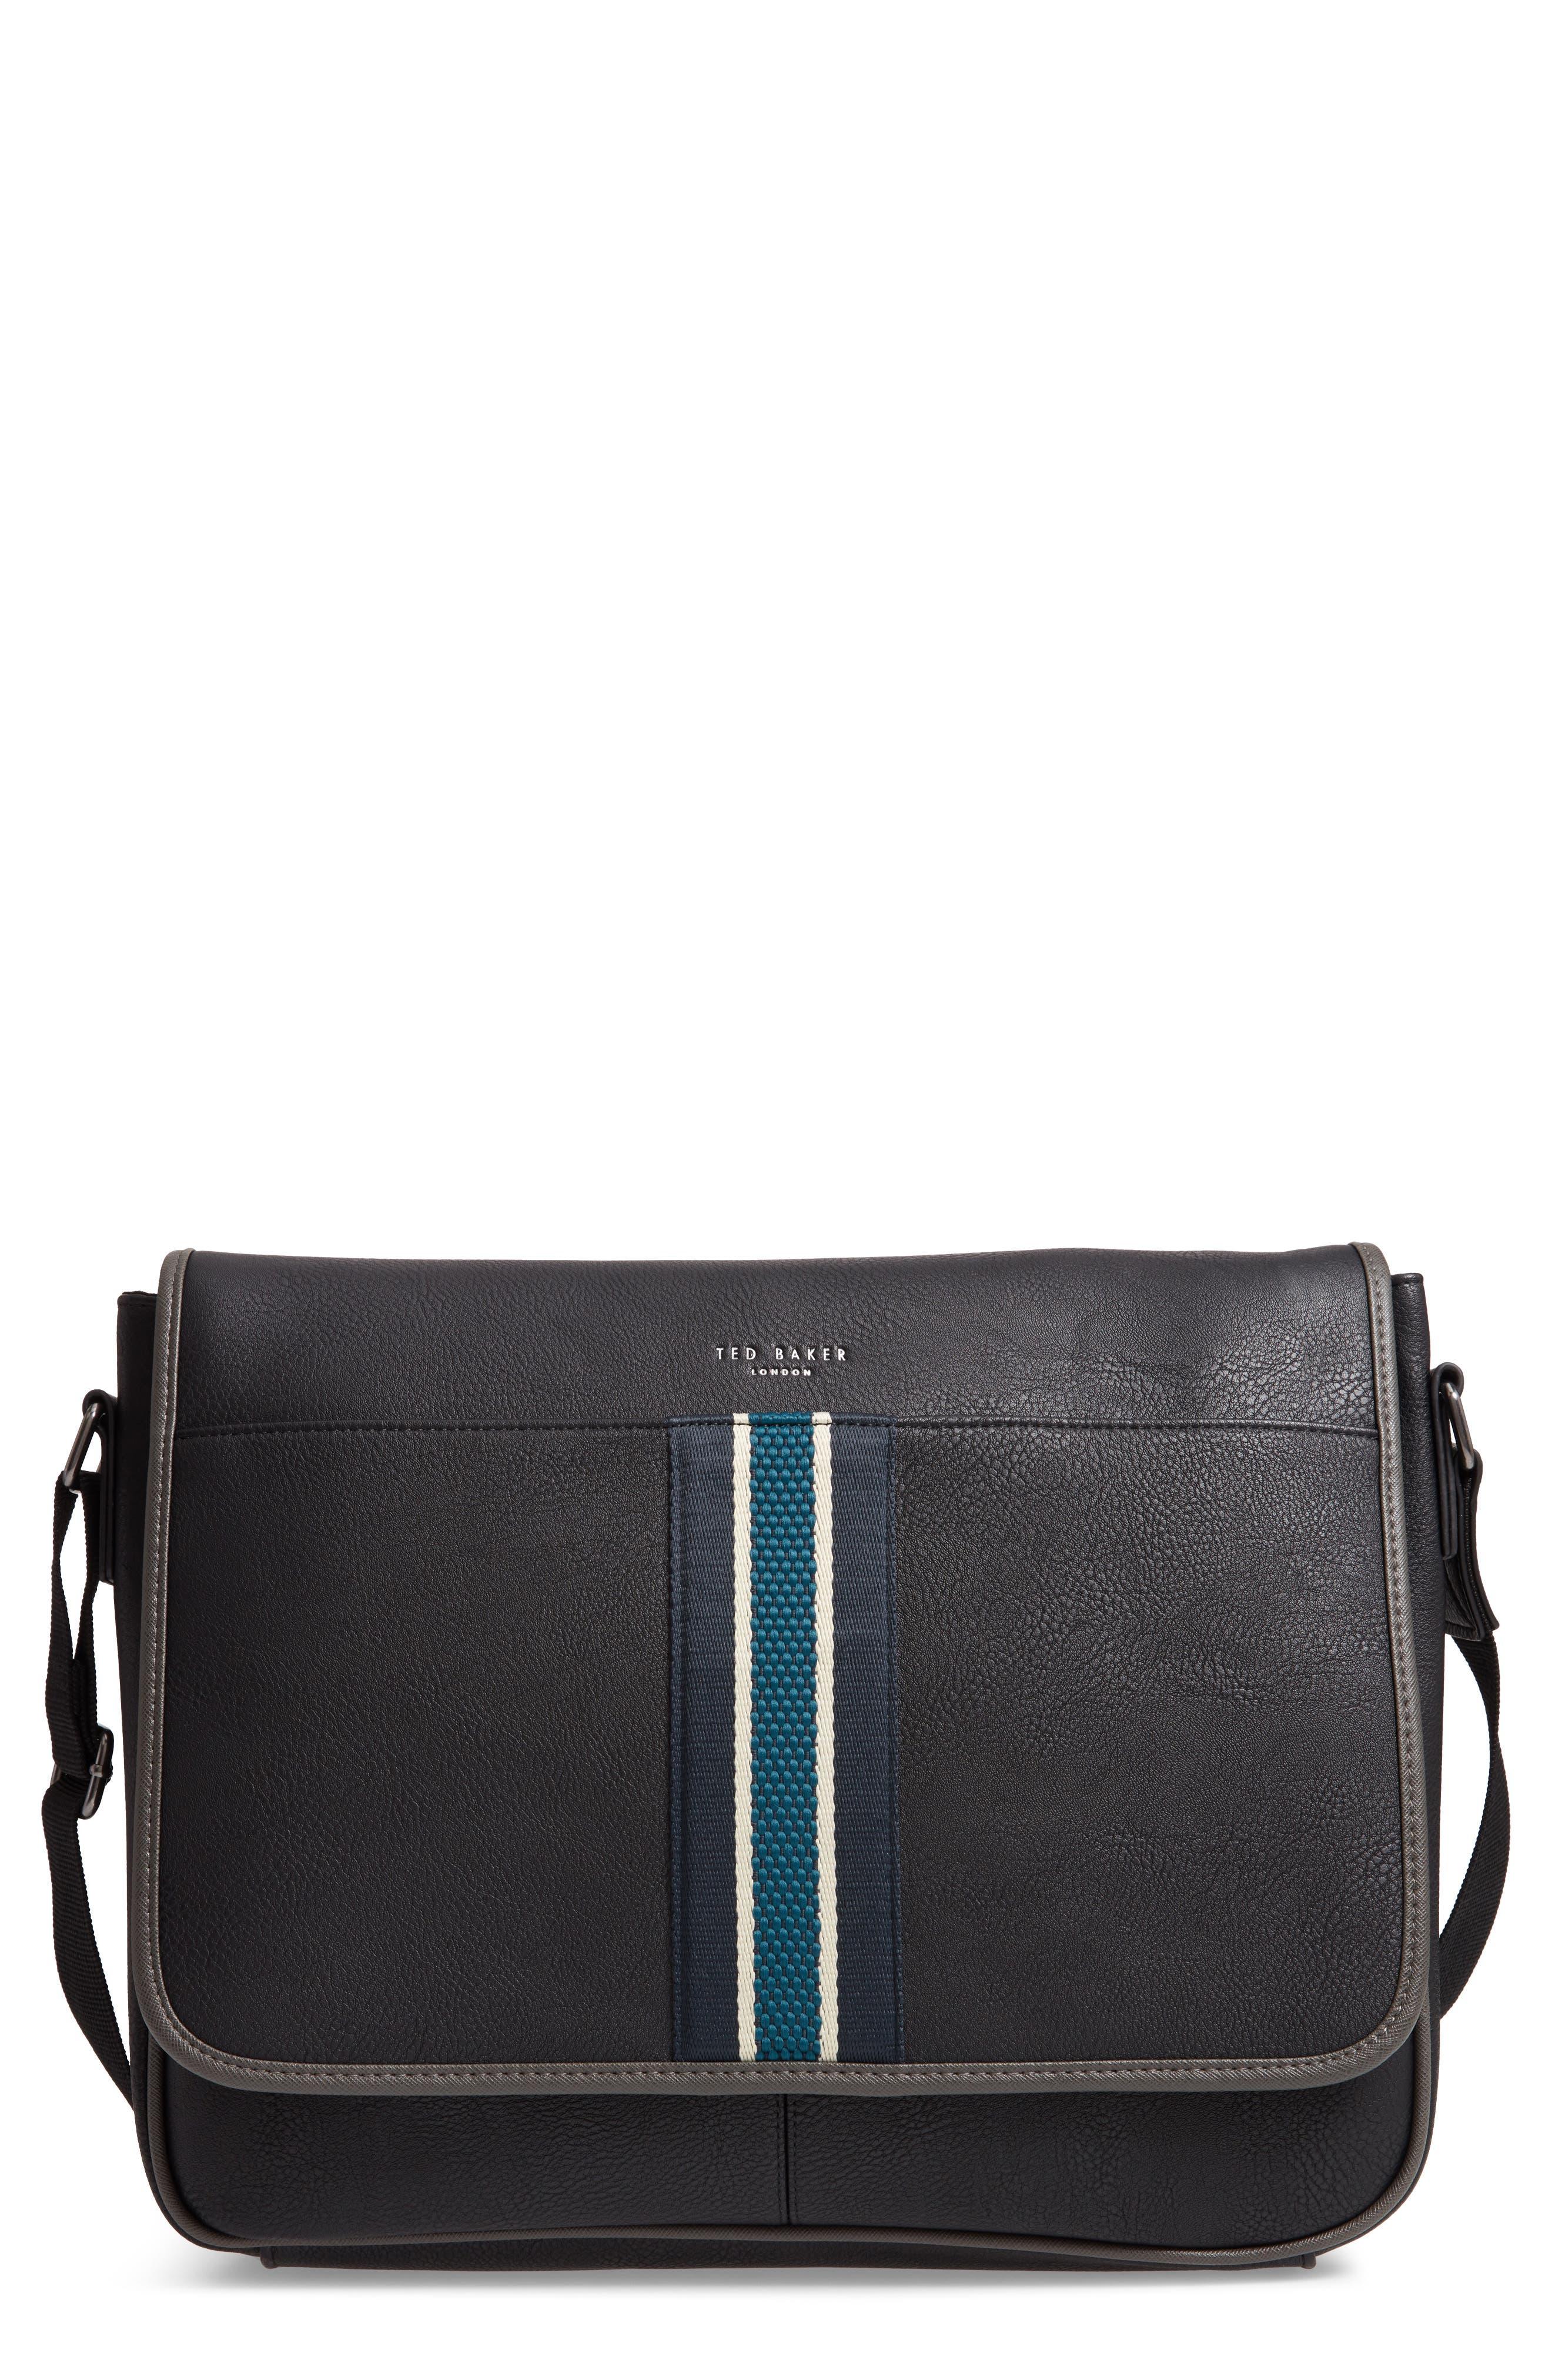 Kingcol Faux Leather Messenger Bag,                             Main thumbnail 1, color,                             Black